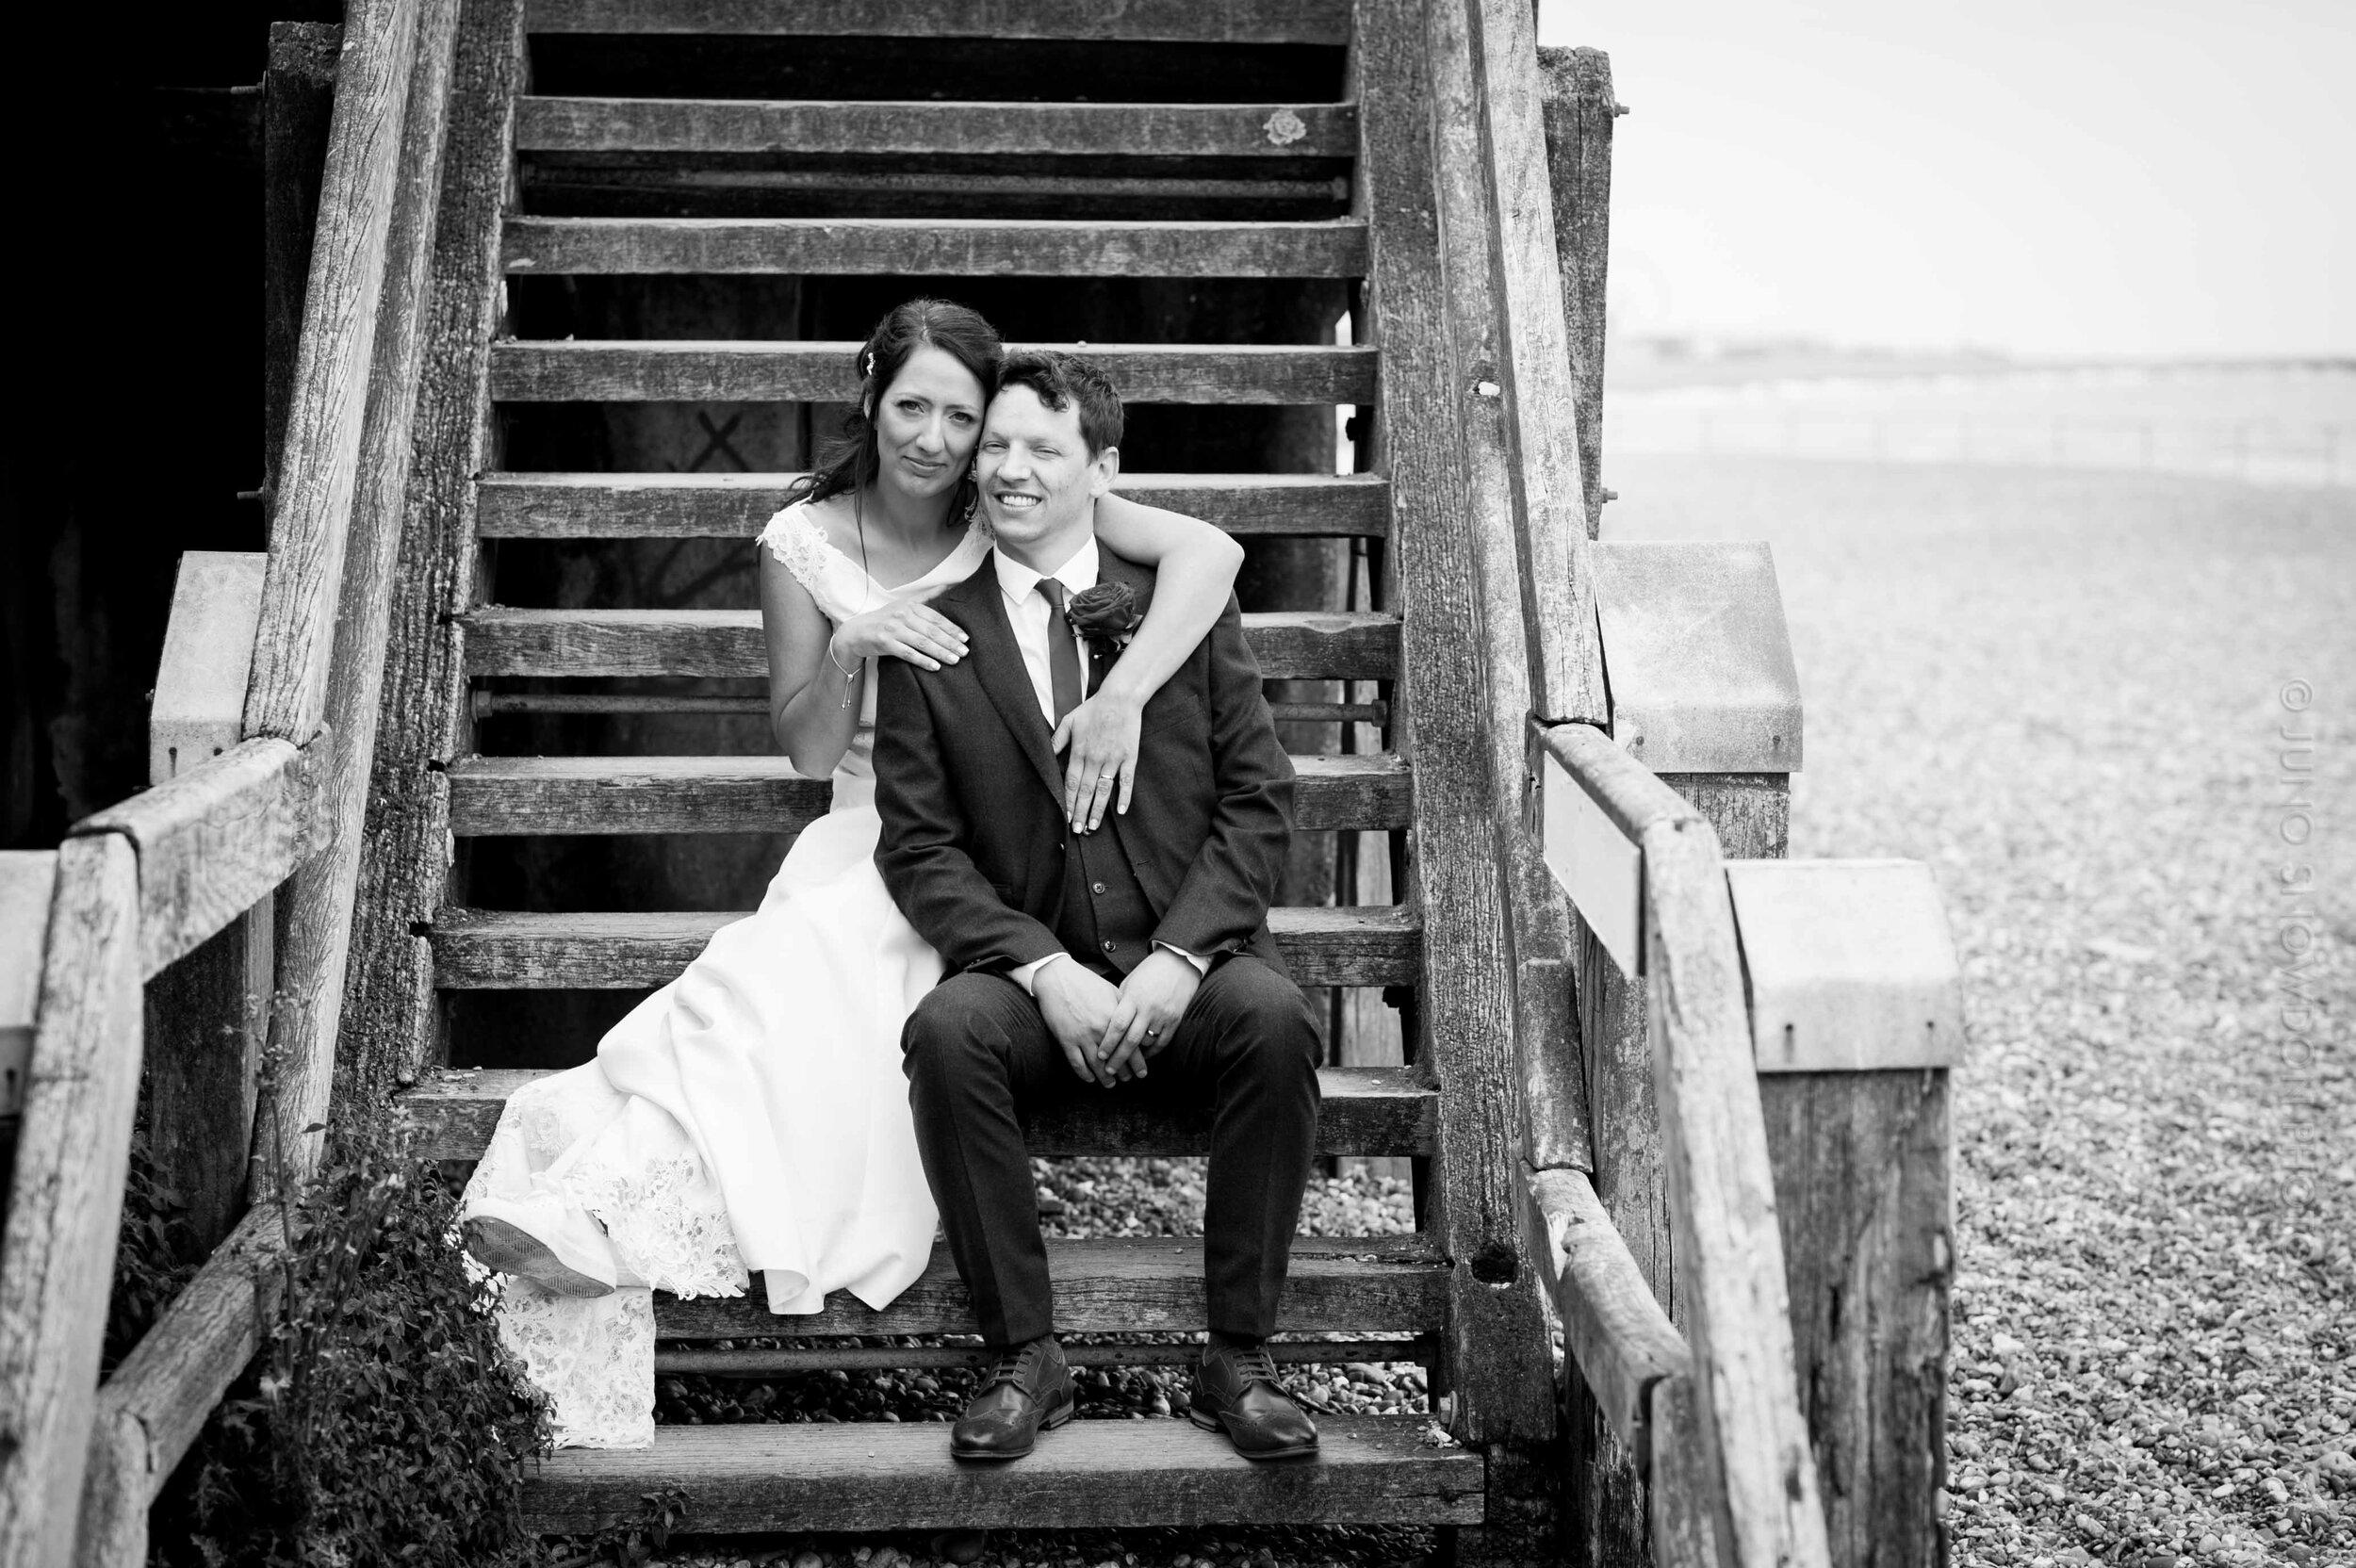 juno-snowdon-photography-wedding-0907.jpg